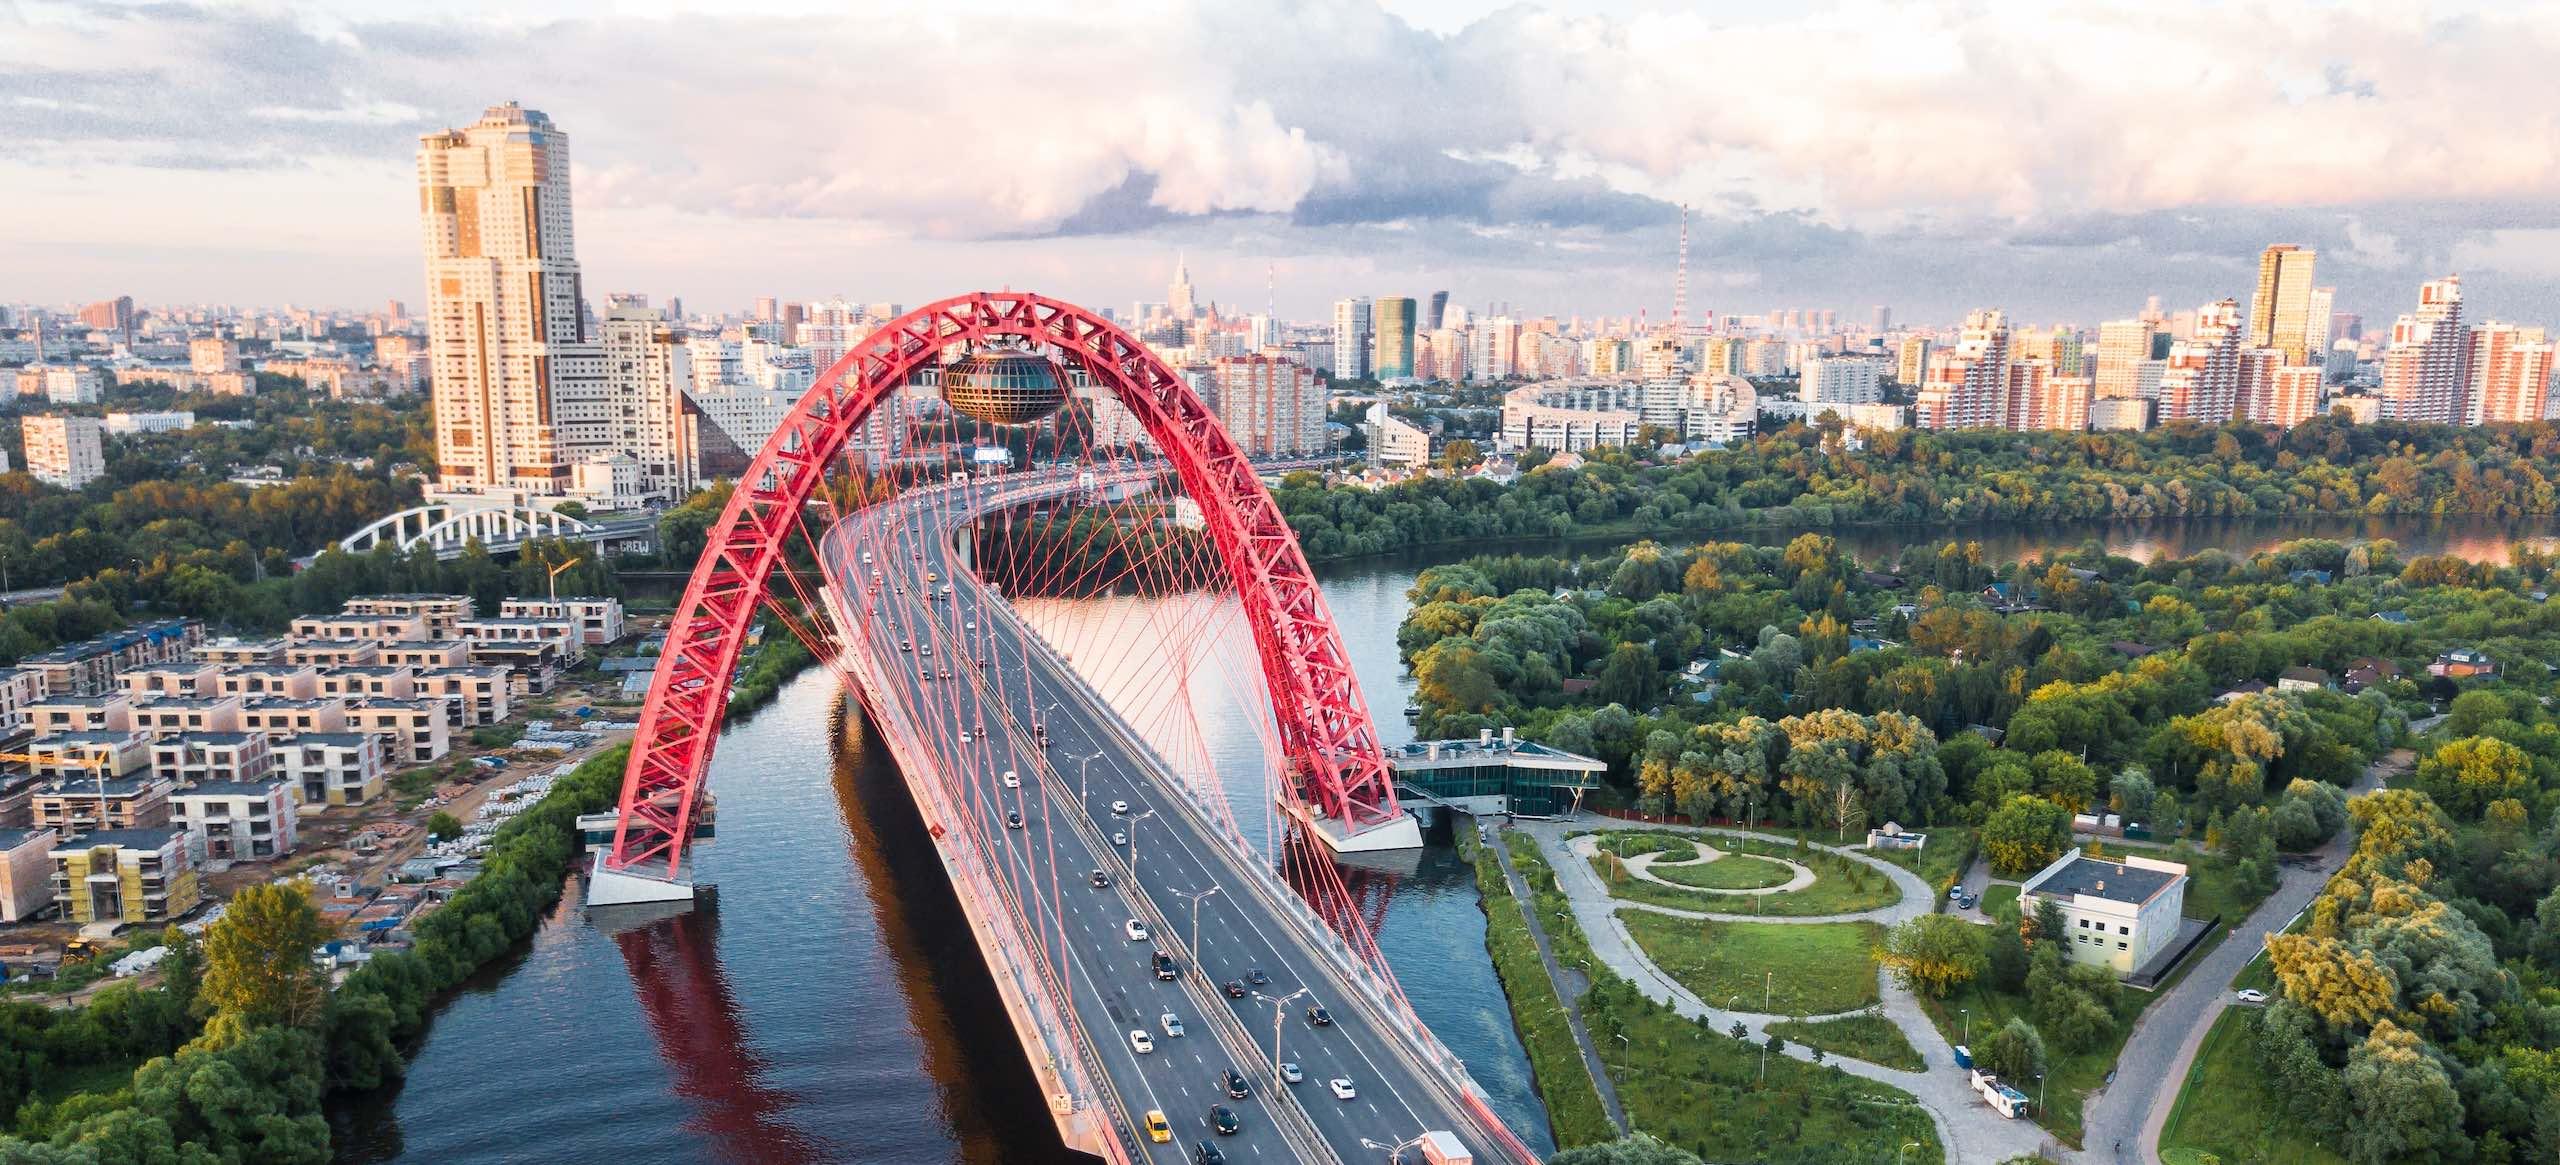 Zhivopisny Bridge | Photo: Alexander Smagin